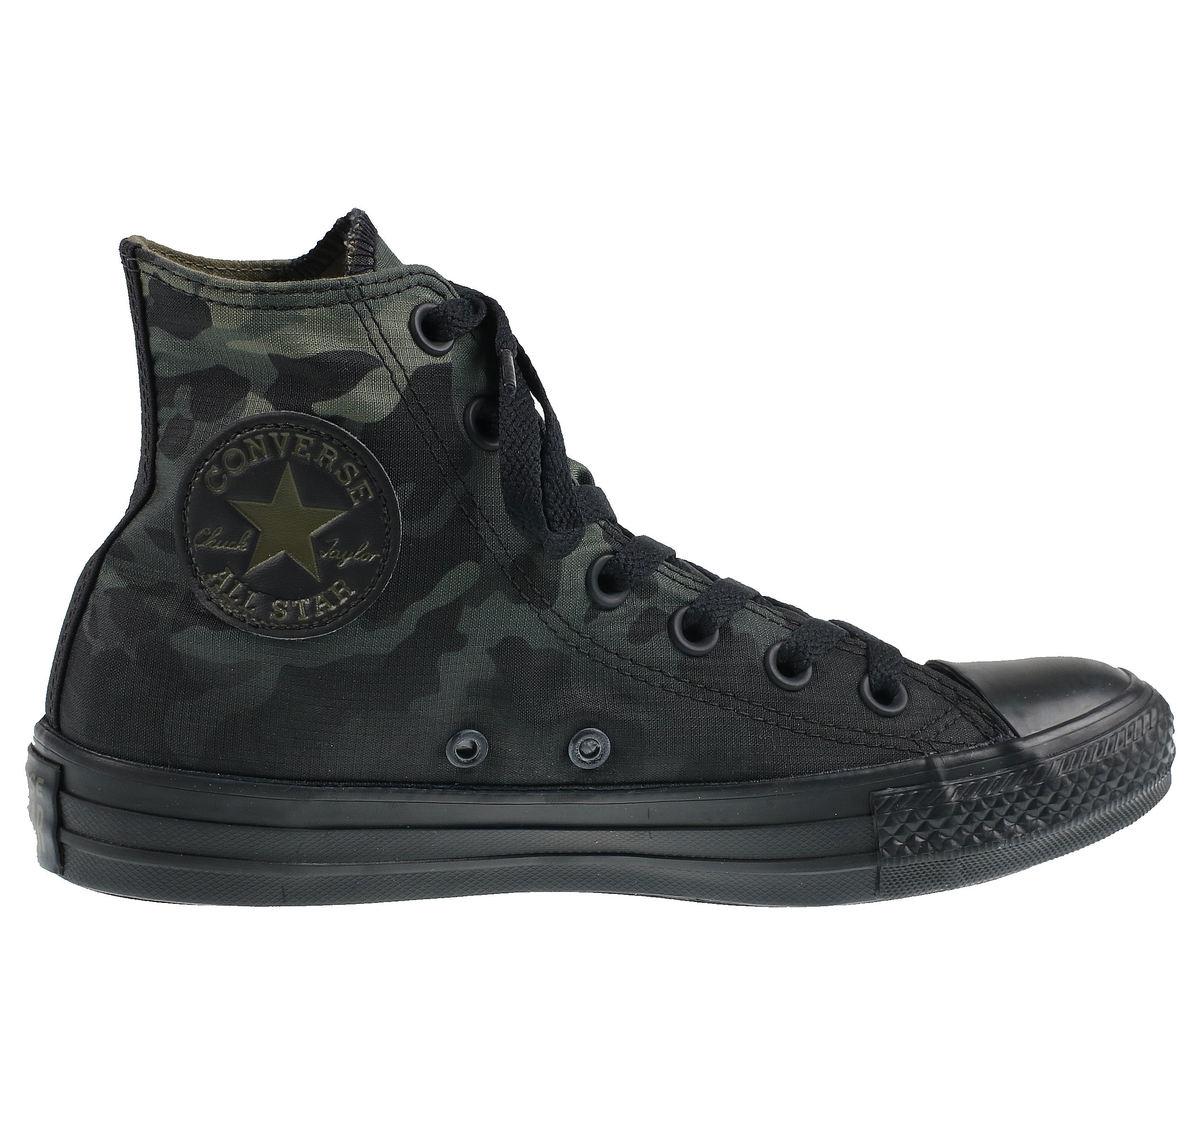 6b2ff0badf88 topánky CONVERSE - CTAS HI FIELD - SURPLUS   BLACK - 163241C ...